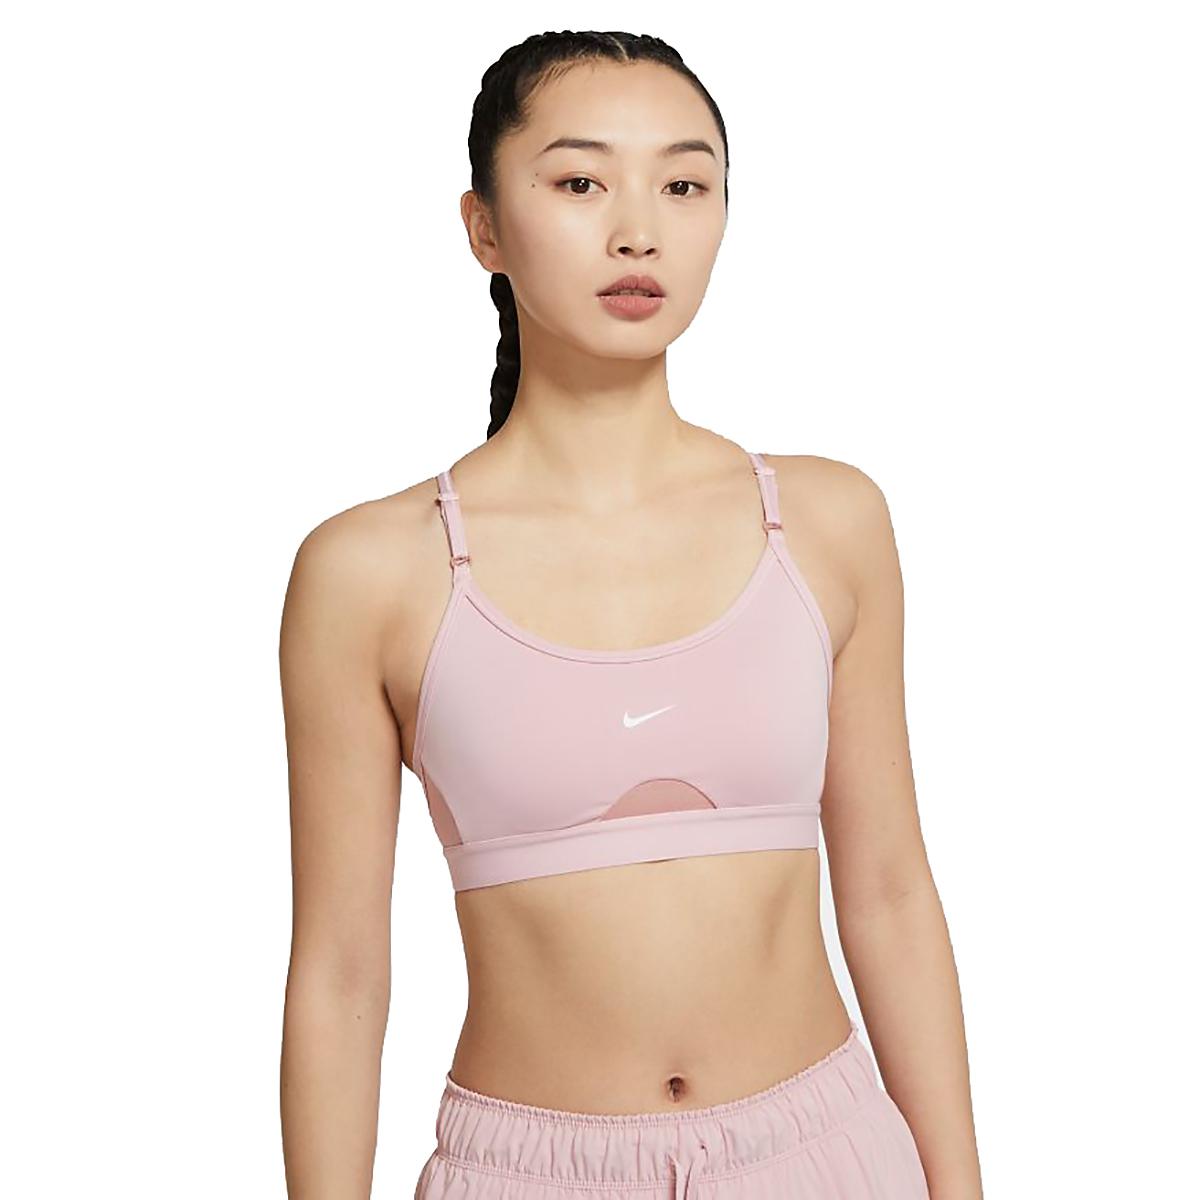 Women's Nike Dri-FIT Indy Light-Support Padded U-Neck Sports Bra - Color: Pink Glaze/Rust Pink/White - Size: XS, Pink Glaze/Rust Pink/White, large, image 1